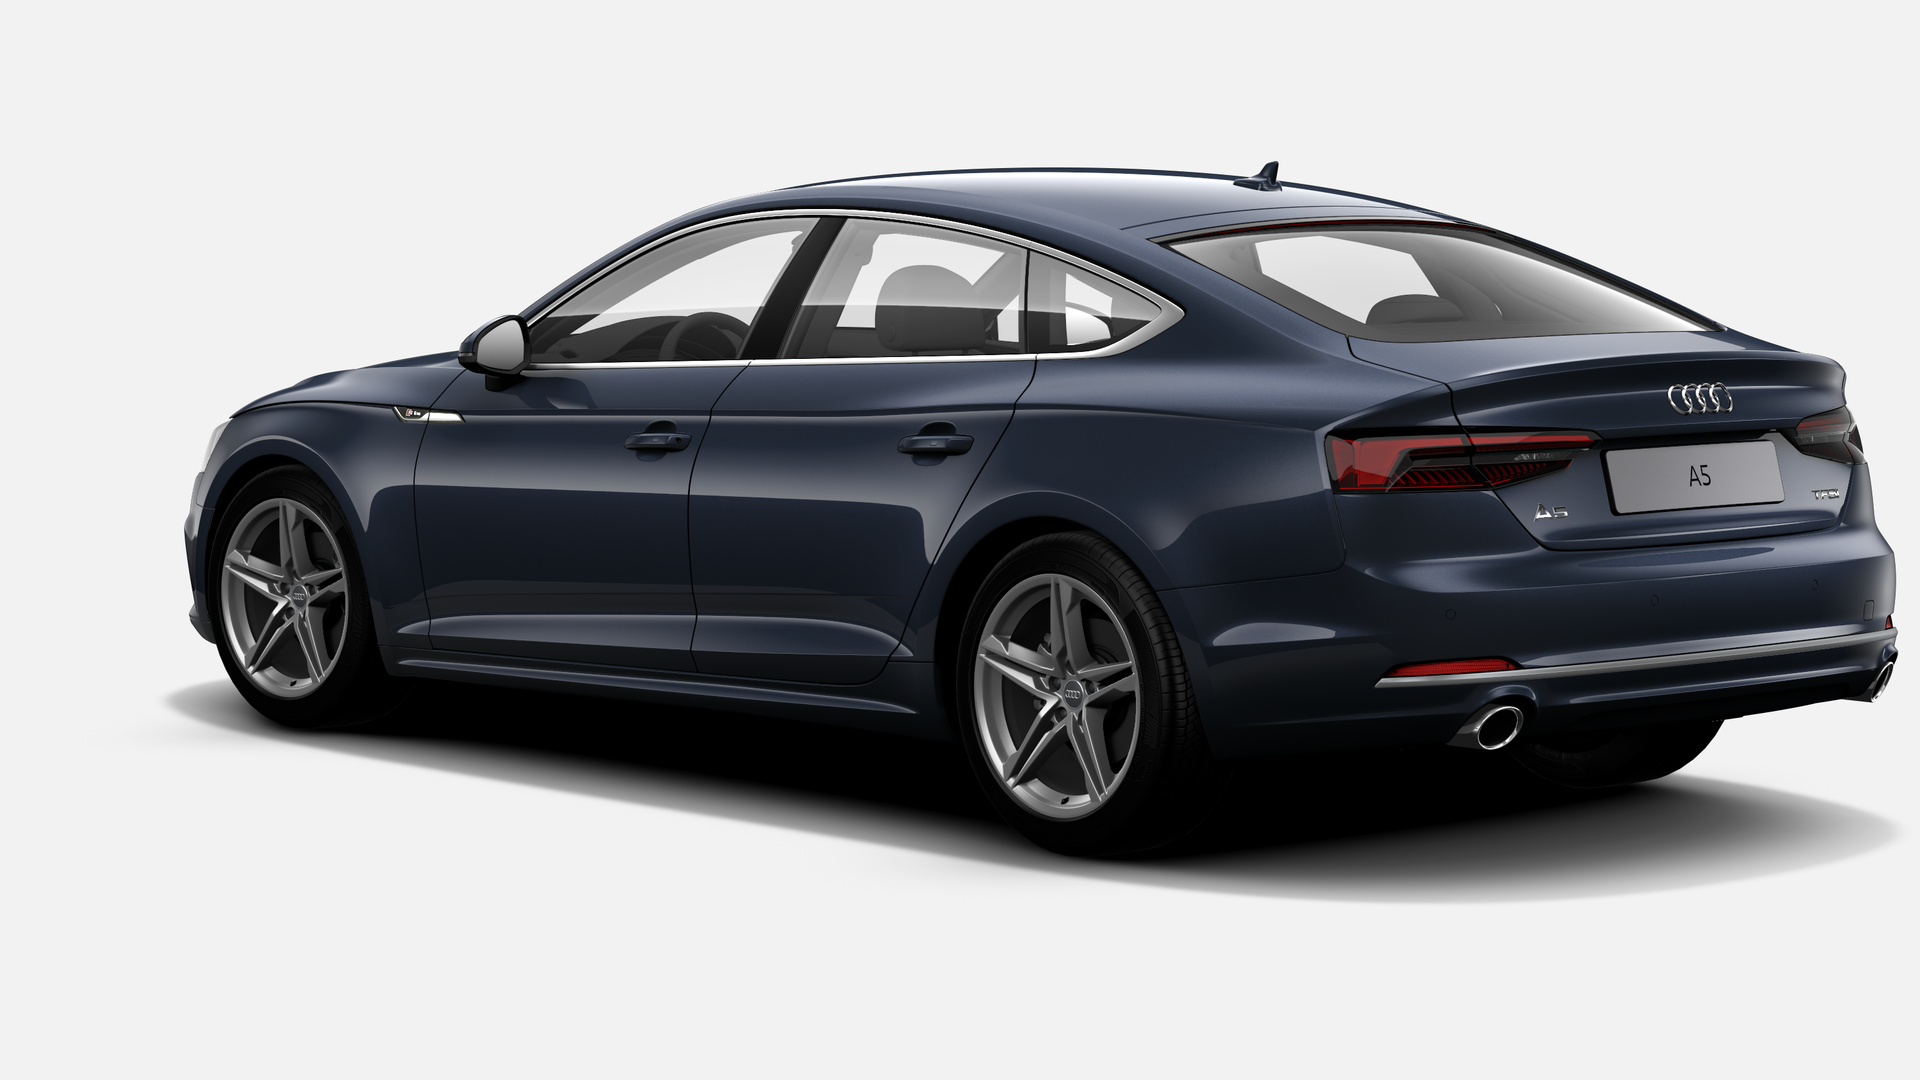 Vista Tres cuartos trasera izquierda de Audi A5 Sportback 2.0 TFSI sport 140 kW (190 CV)